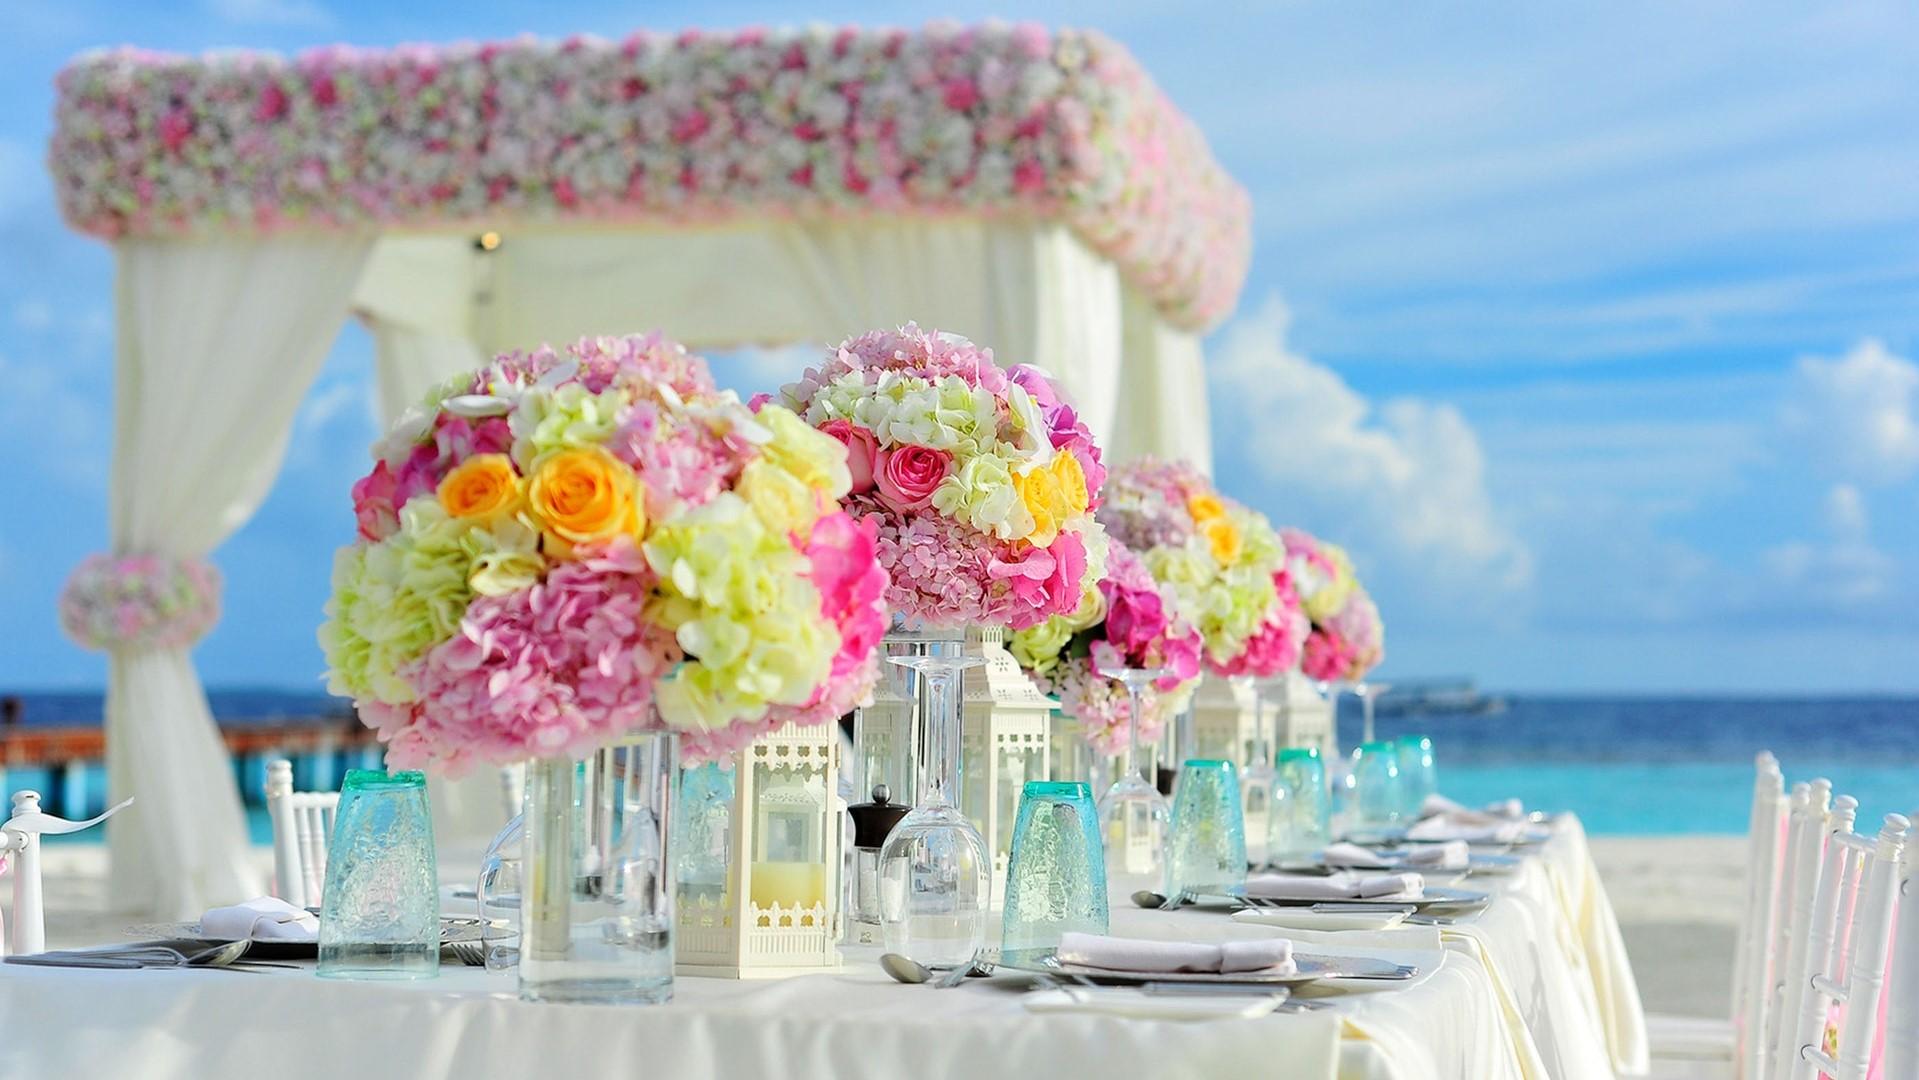 beach-bunch-of-flowers-celebration